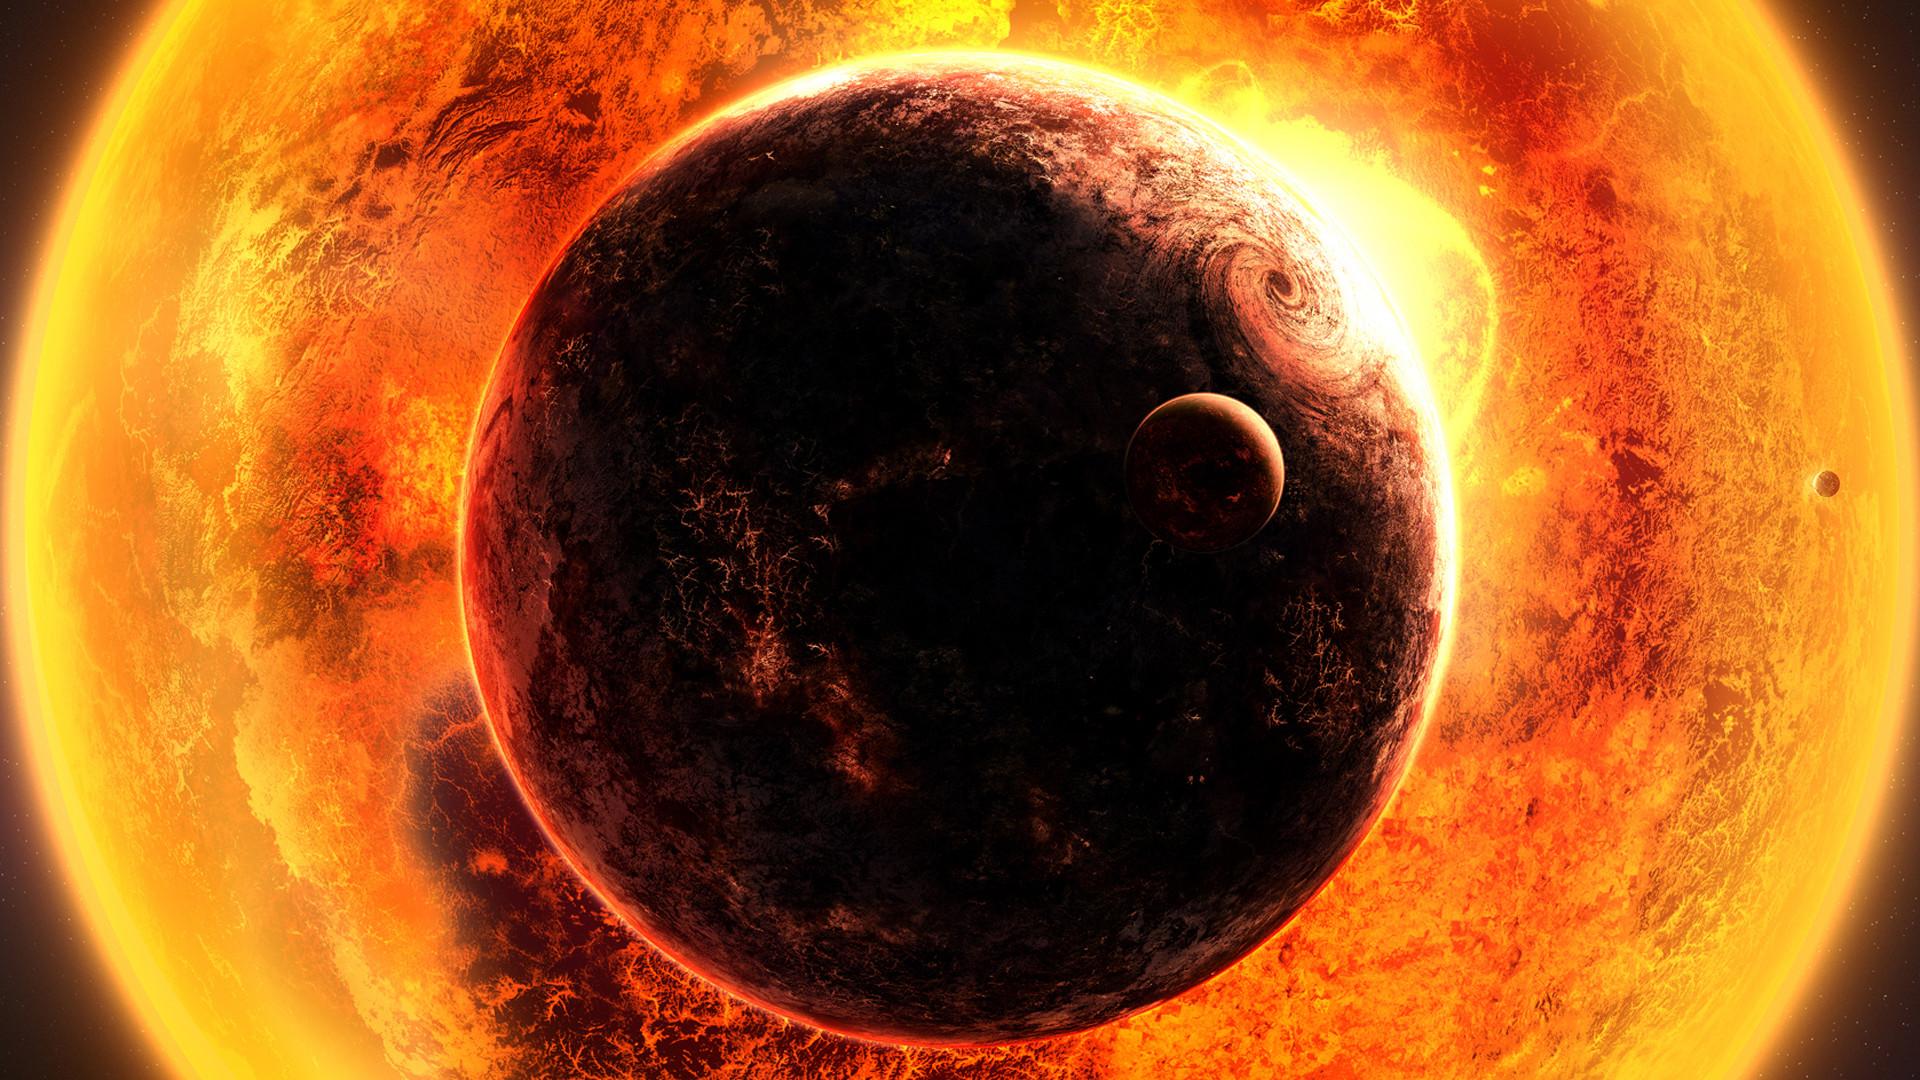 Res: 1920x1080, Space fantasy sun planet